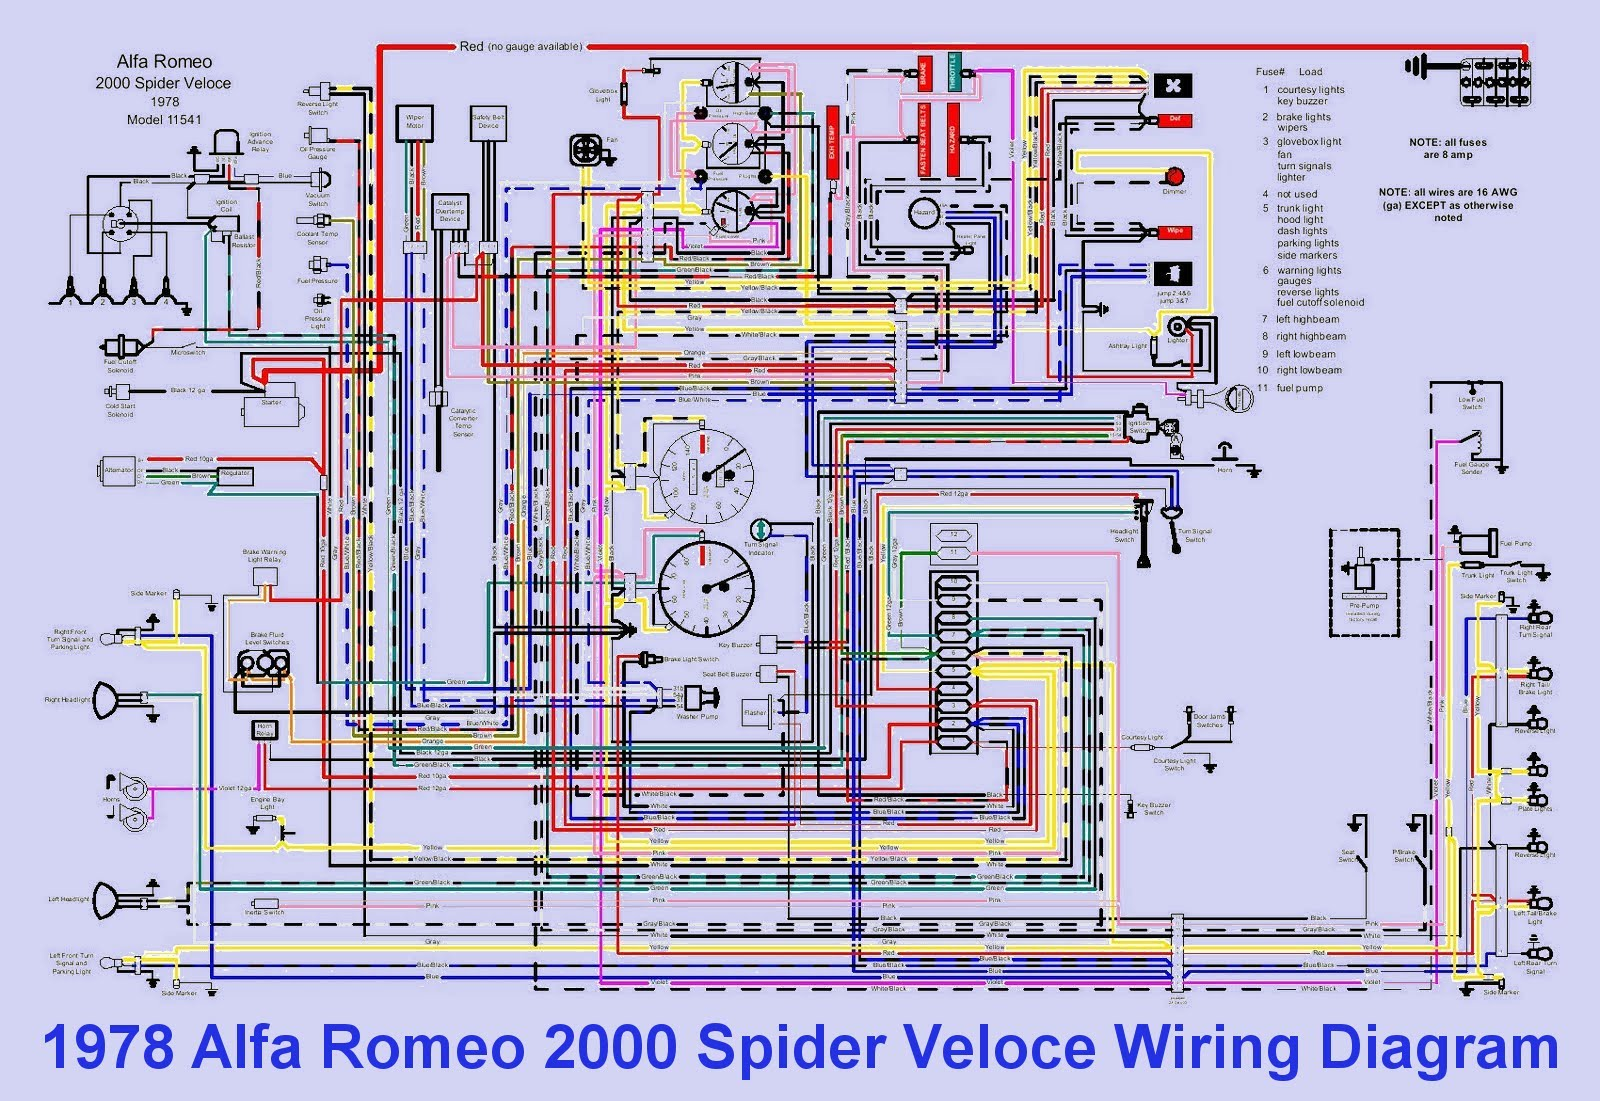 1978 Alfa Romeo 2000 Spider Veloce Wiring Diagram Auto Wiring